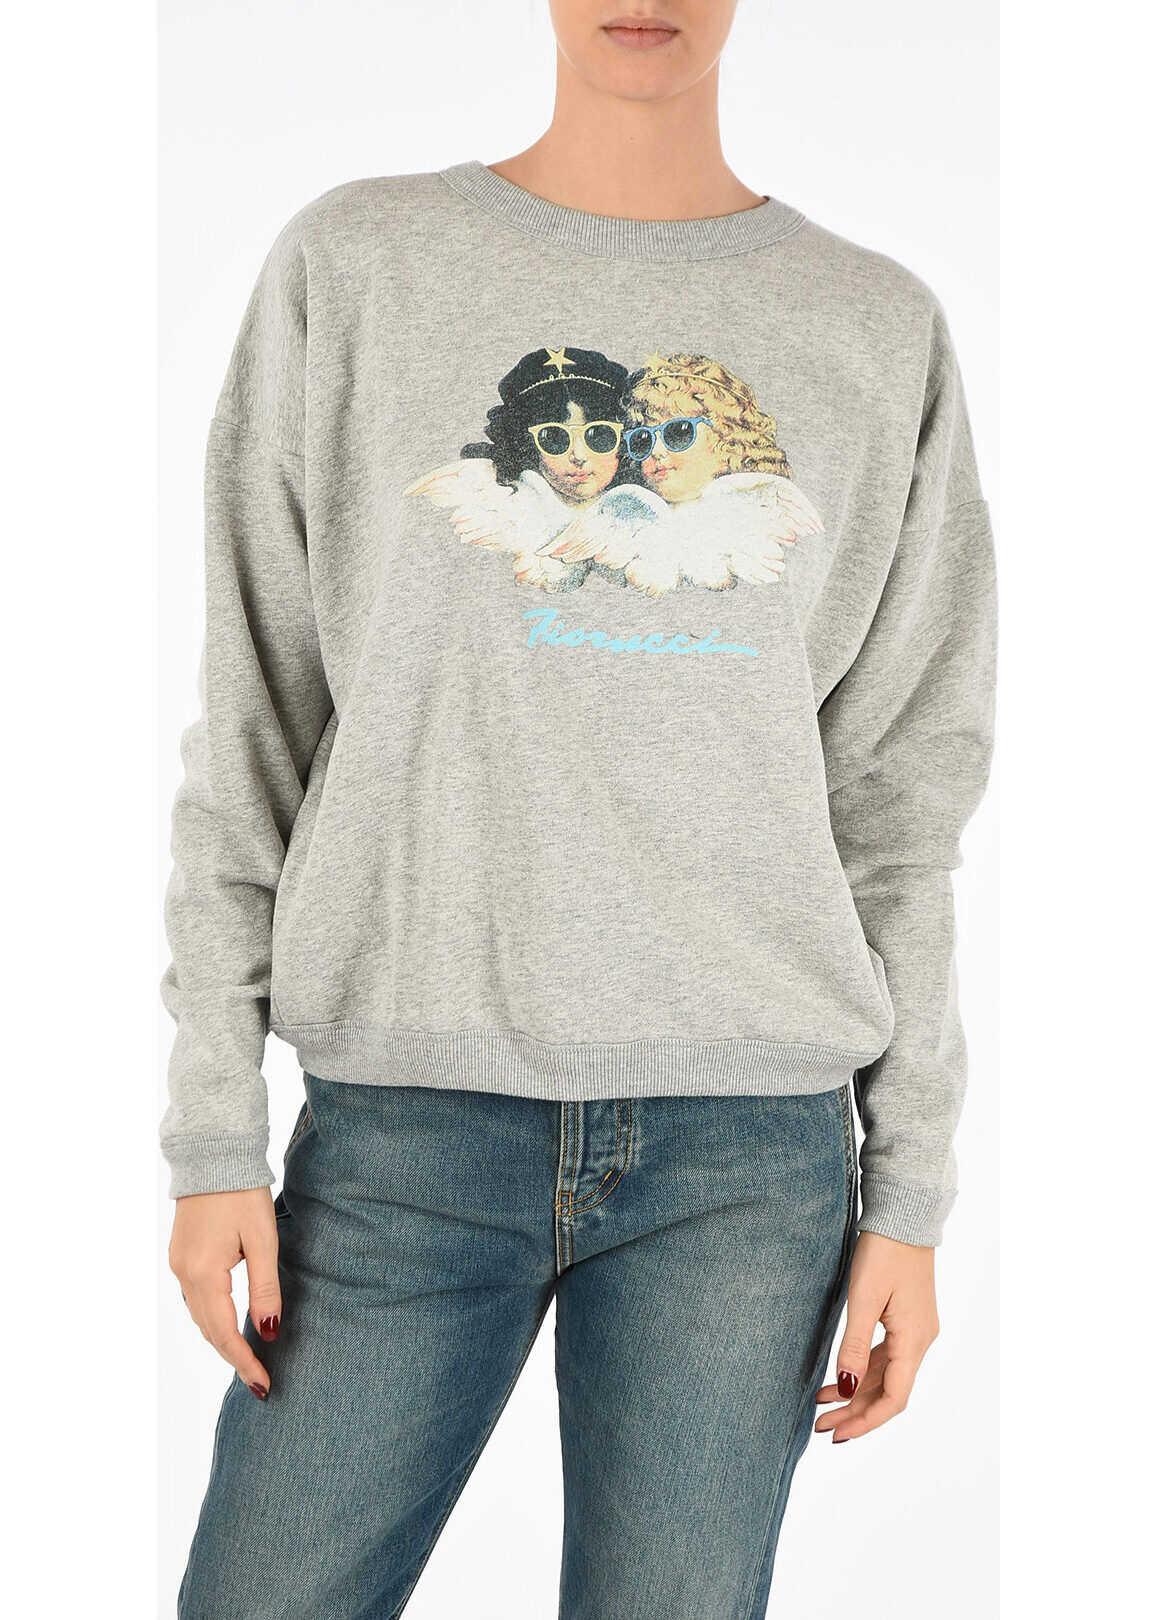 Fiorucci Printed Sweatshirt GRAY